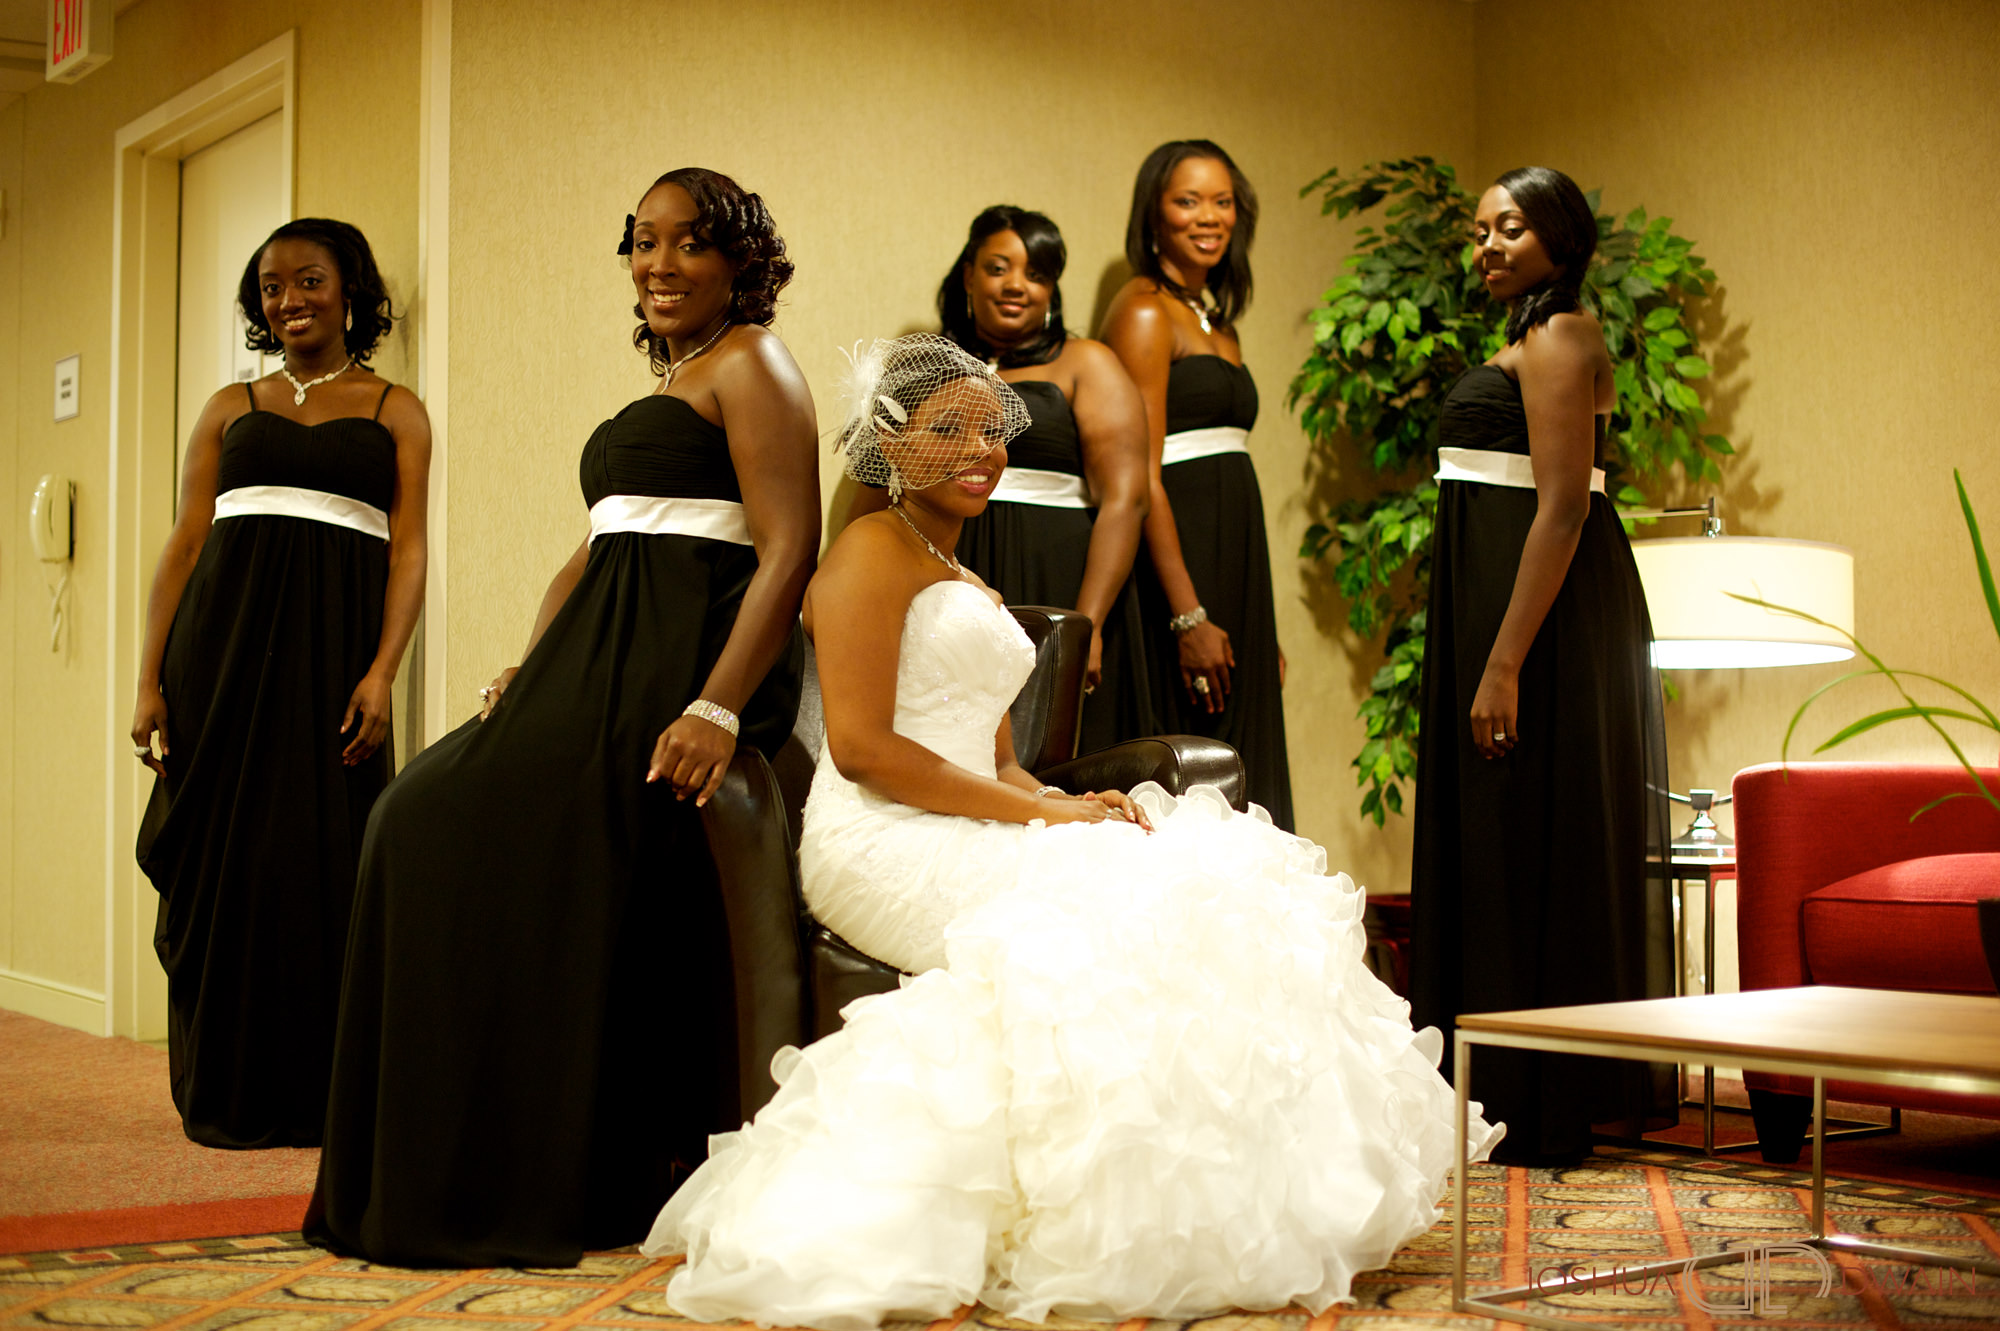 natifia-don-005-greentree-country-clubnew-rochelle-new-york-wedding-photographer-joshua-dwain-20101023_dn_0128